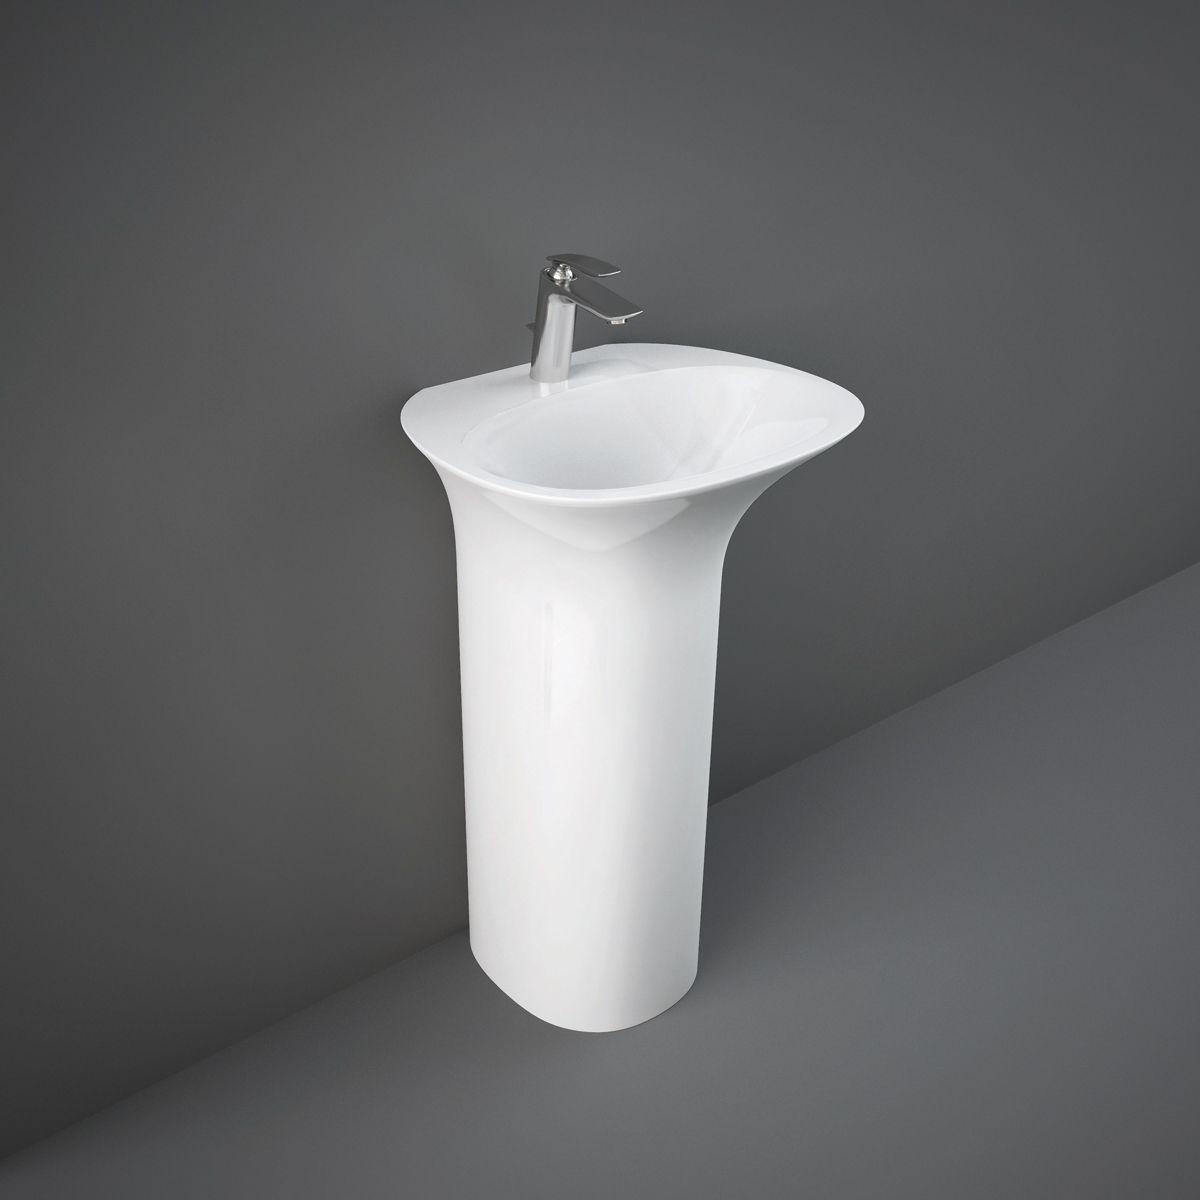 RAK Sensation Gloss White 1 Tap Hole Freestanding Basin 550mm